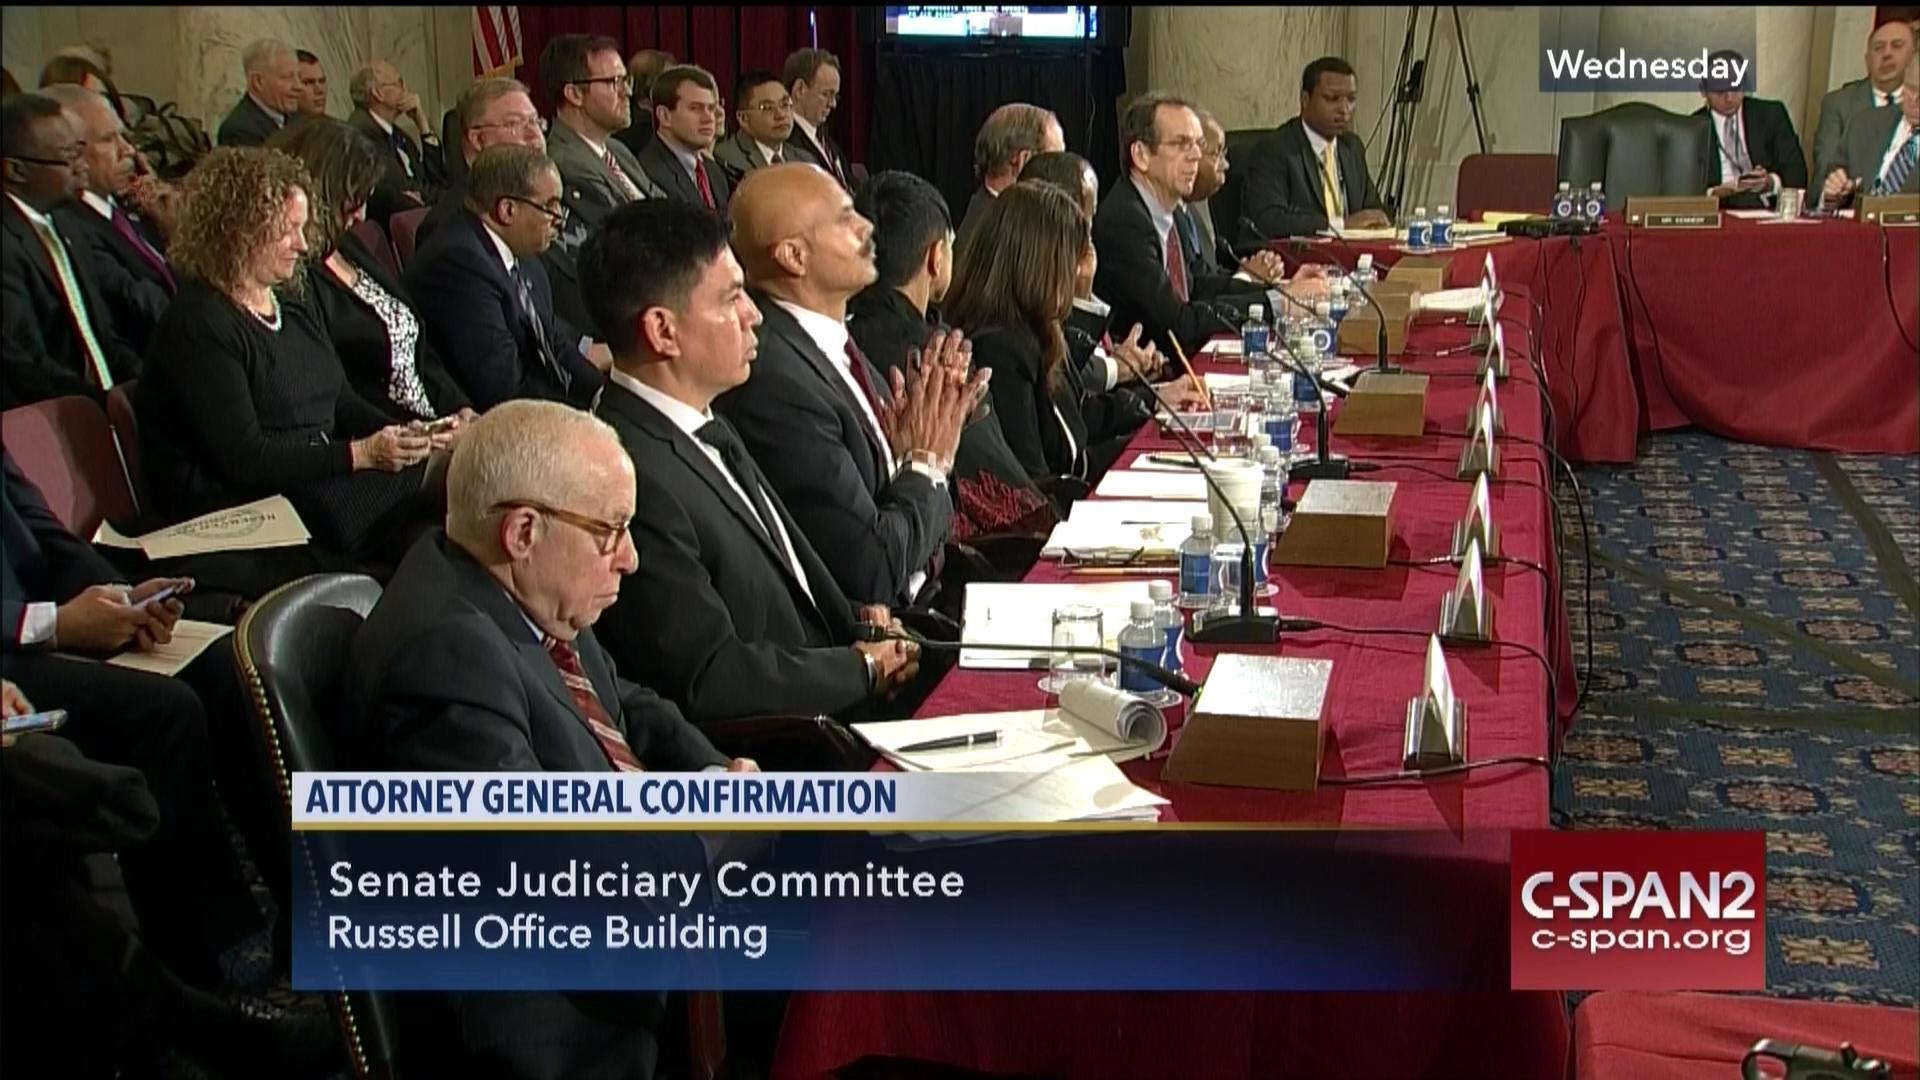 cory booker john lewis testify jeff sessions ag nomination jan 11 2017 - Attorney General Job Description